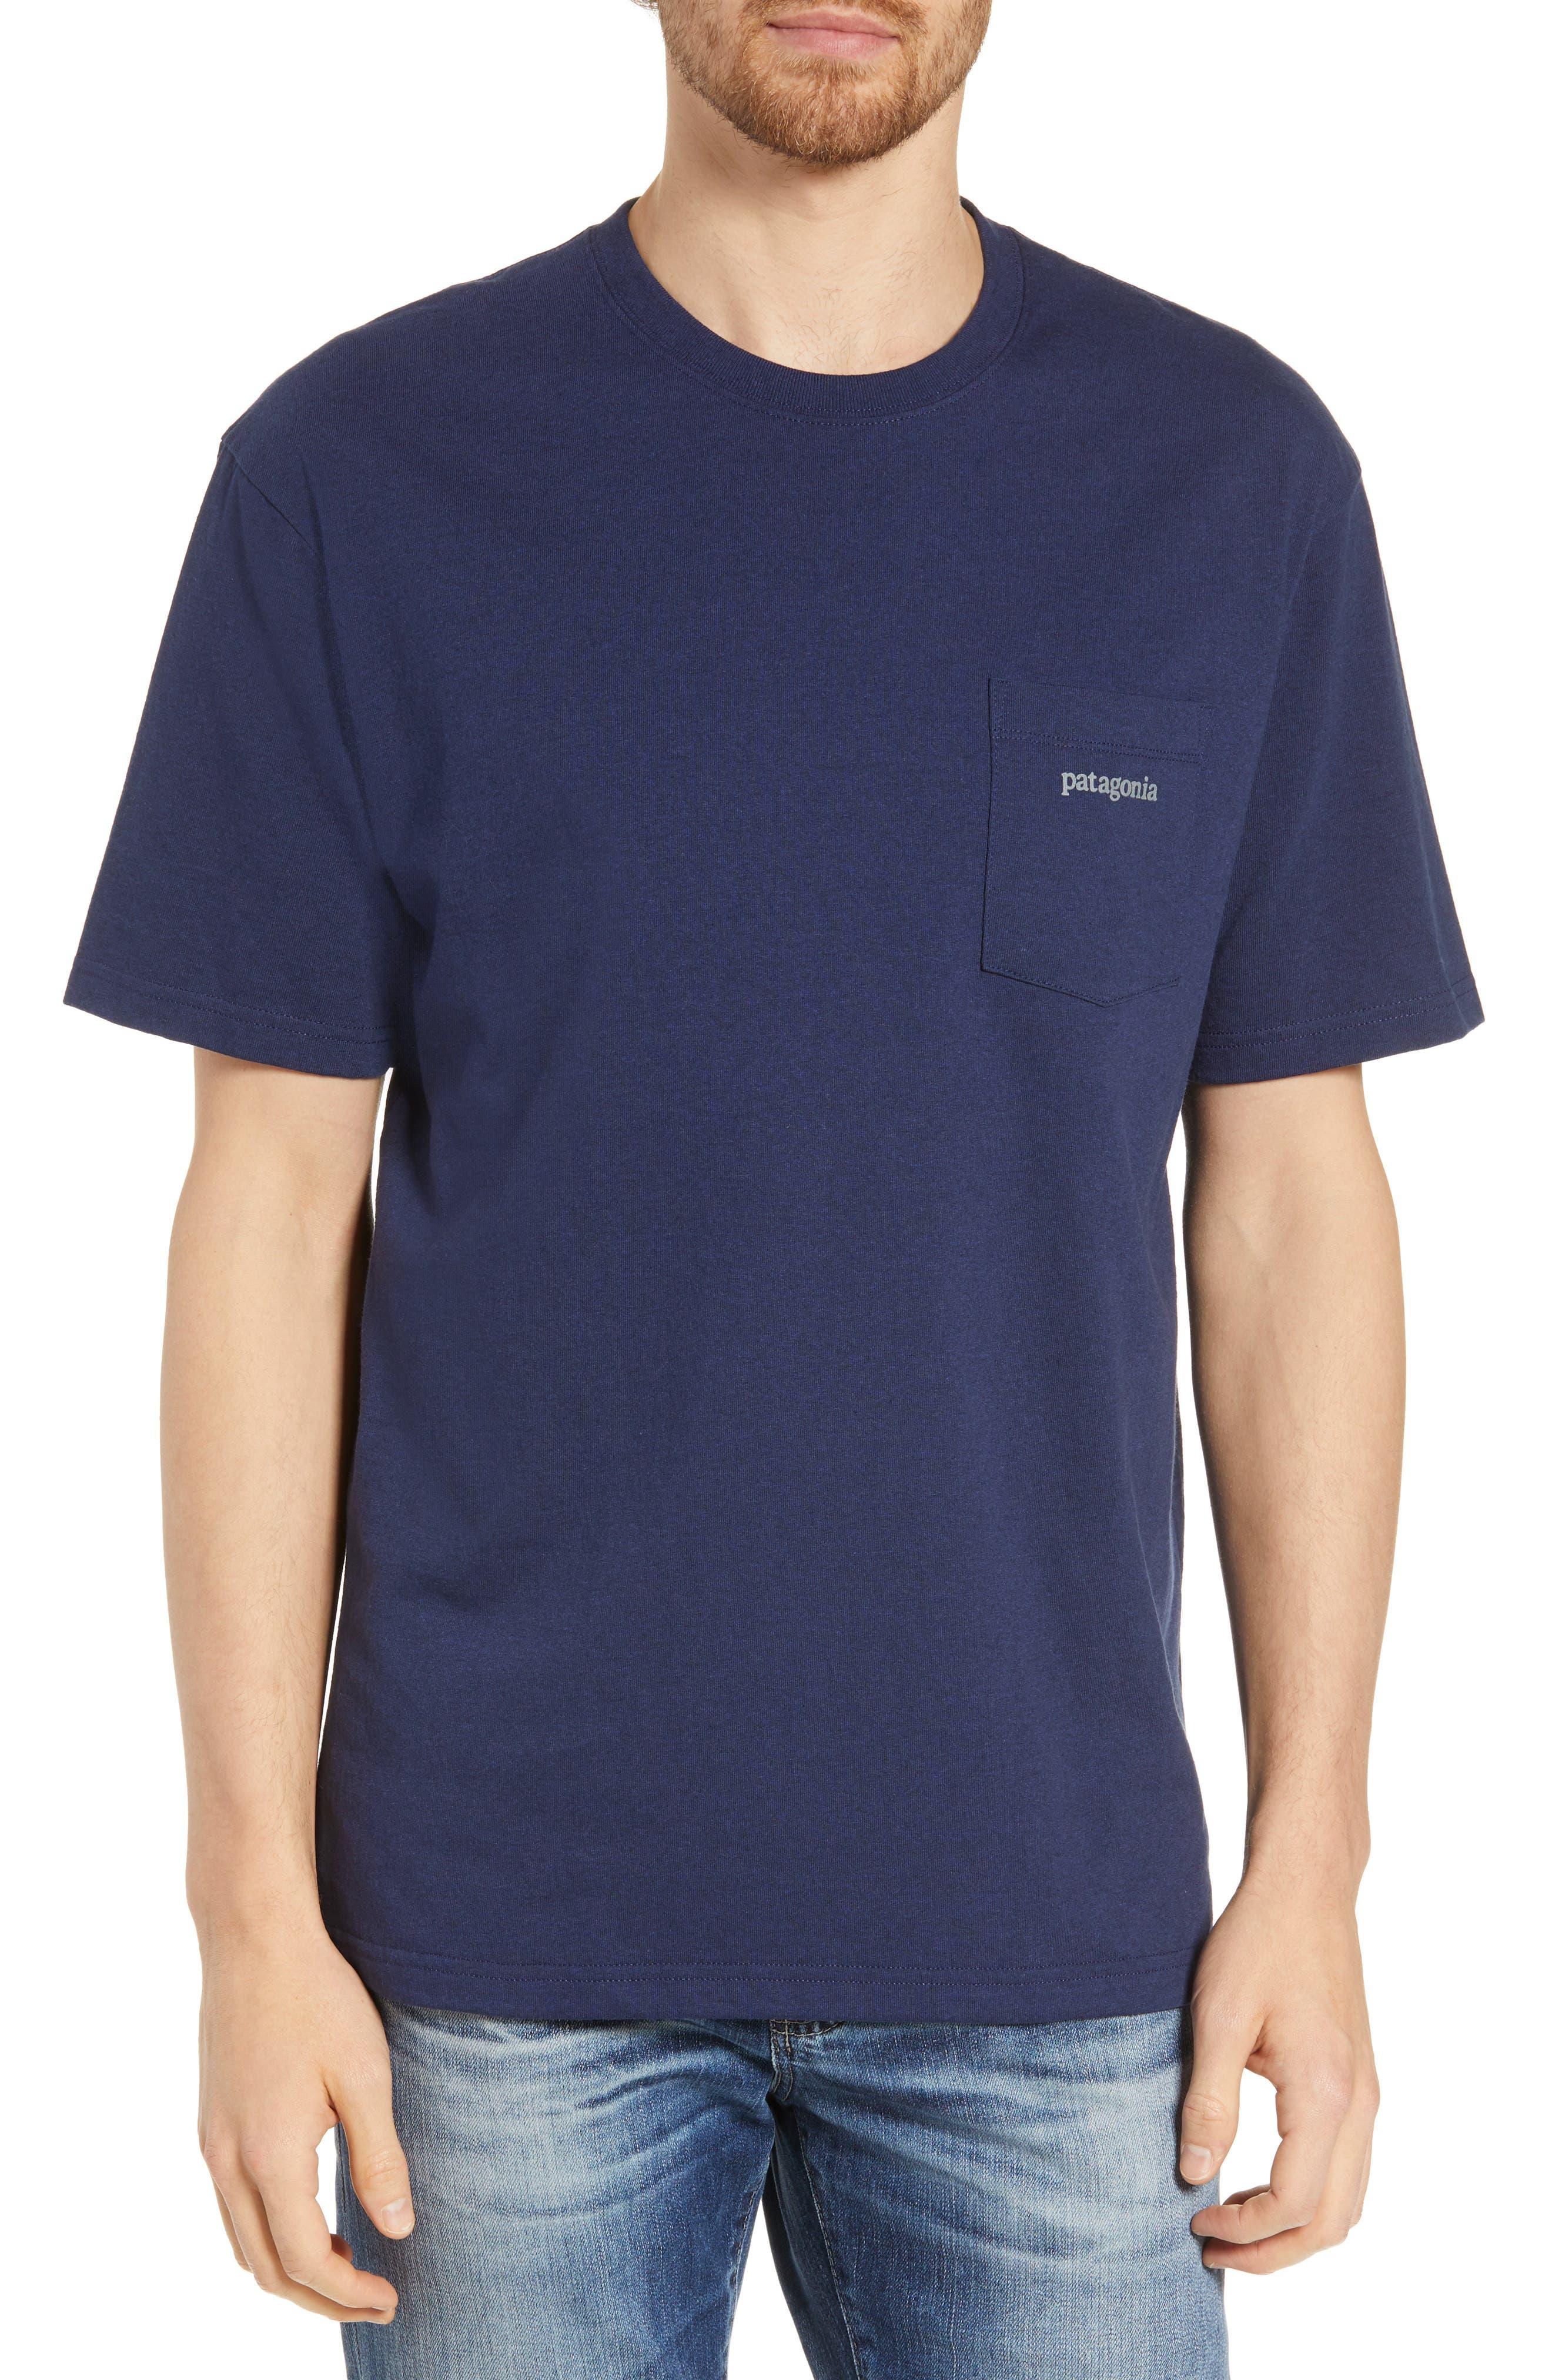 Patagonia Line Ridge Logo Resposibili-Tee Pocket T-Shirt, Blue